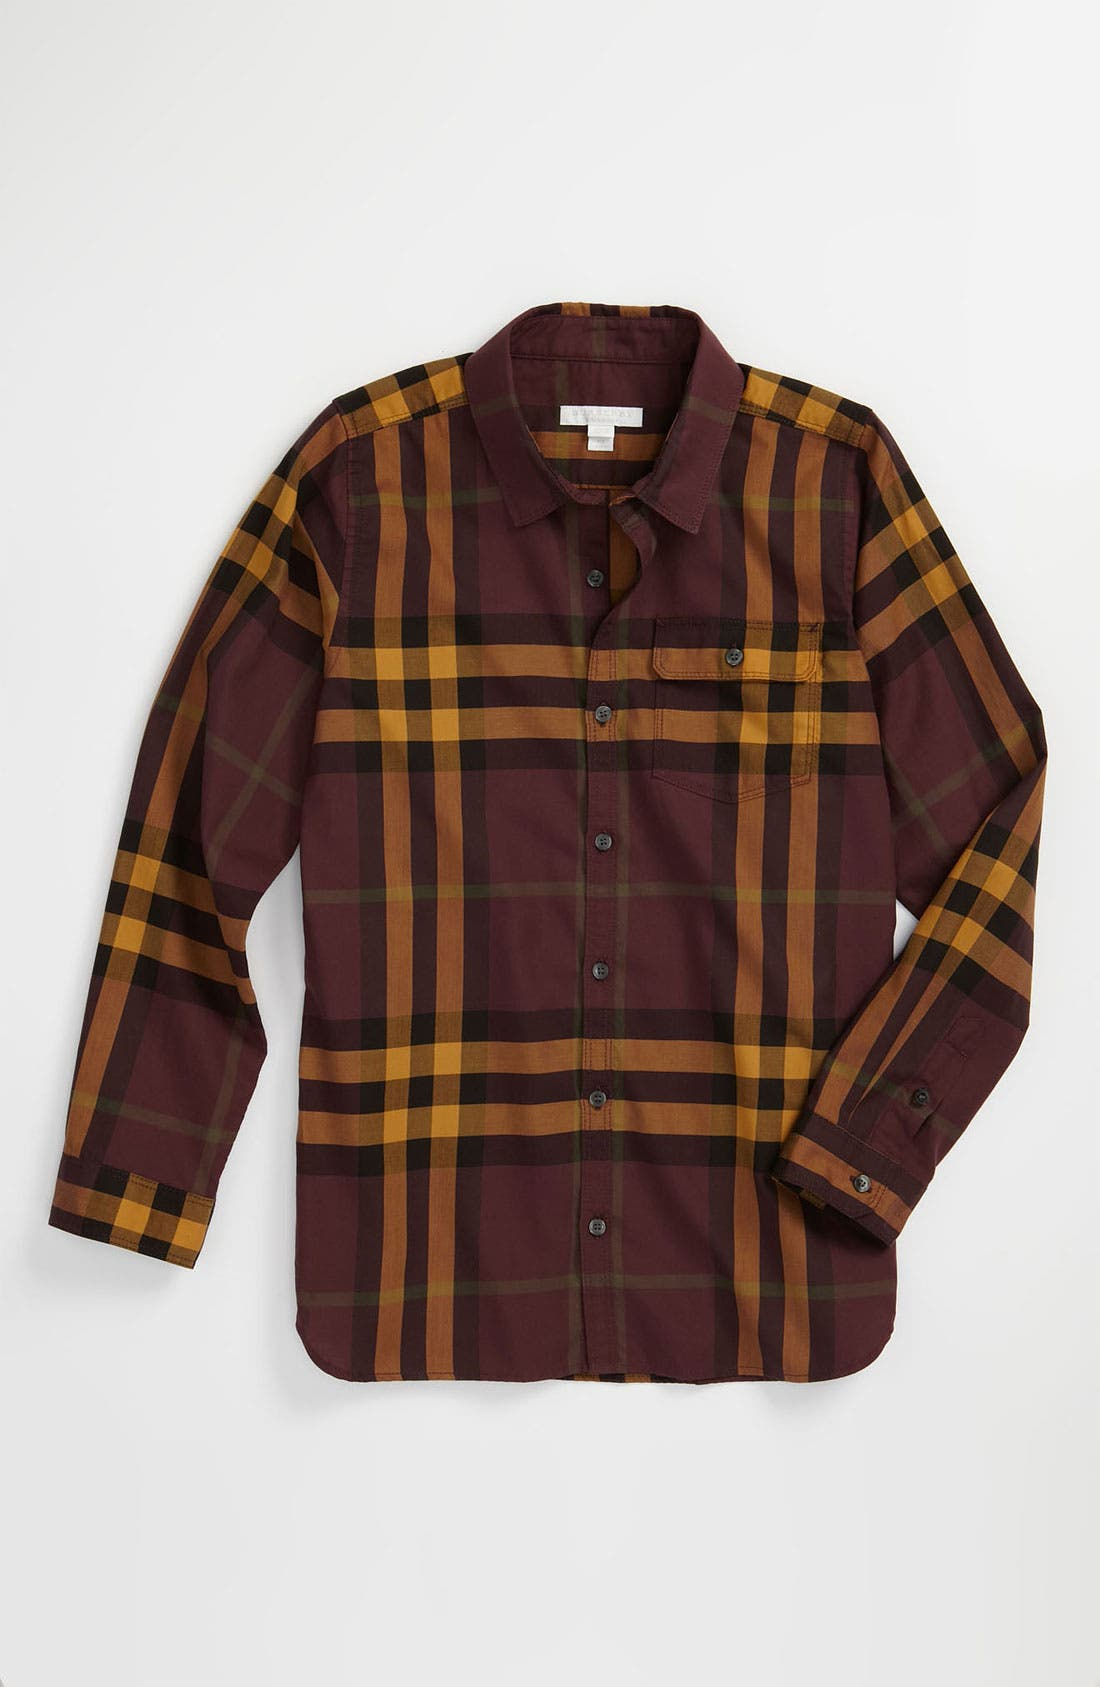 Alternate Image 1 Selected - Burberry Check Print Shirt (Little Boys)